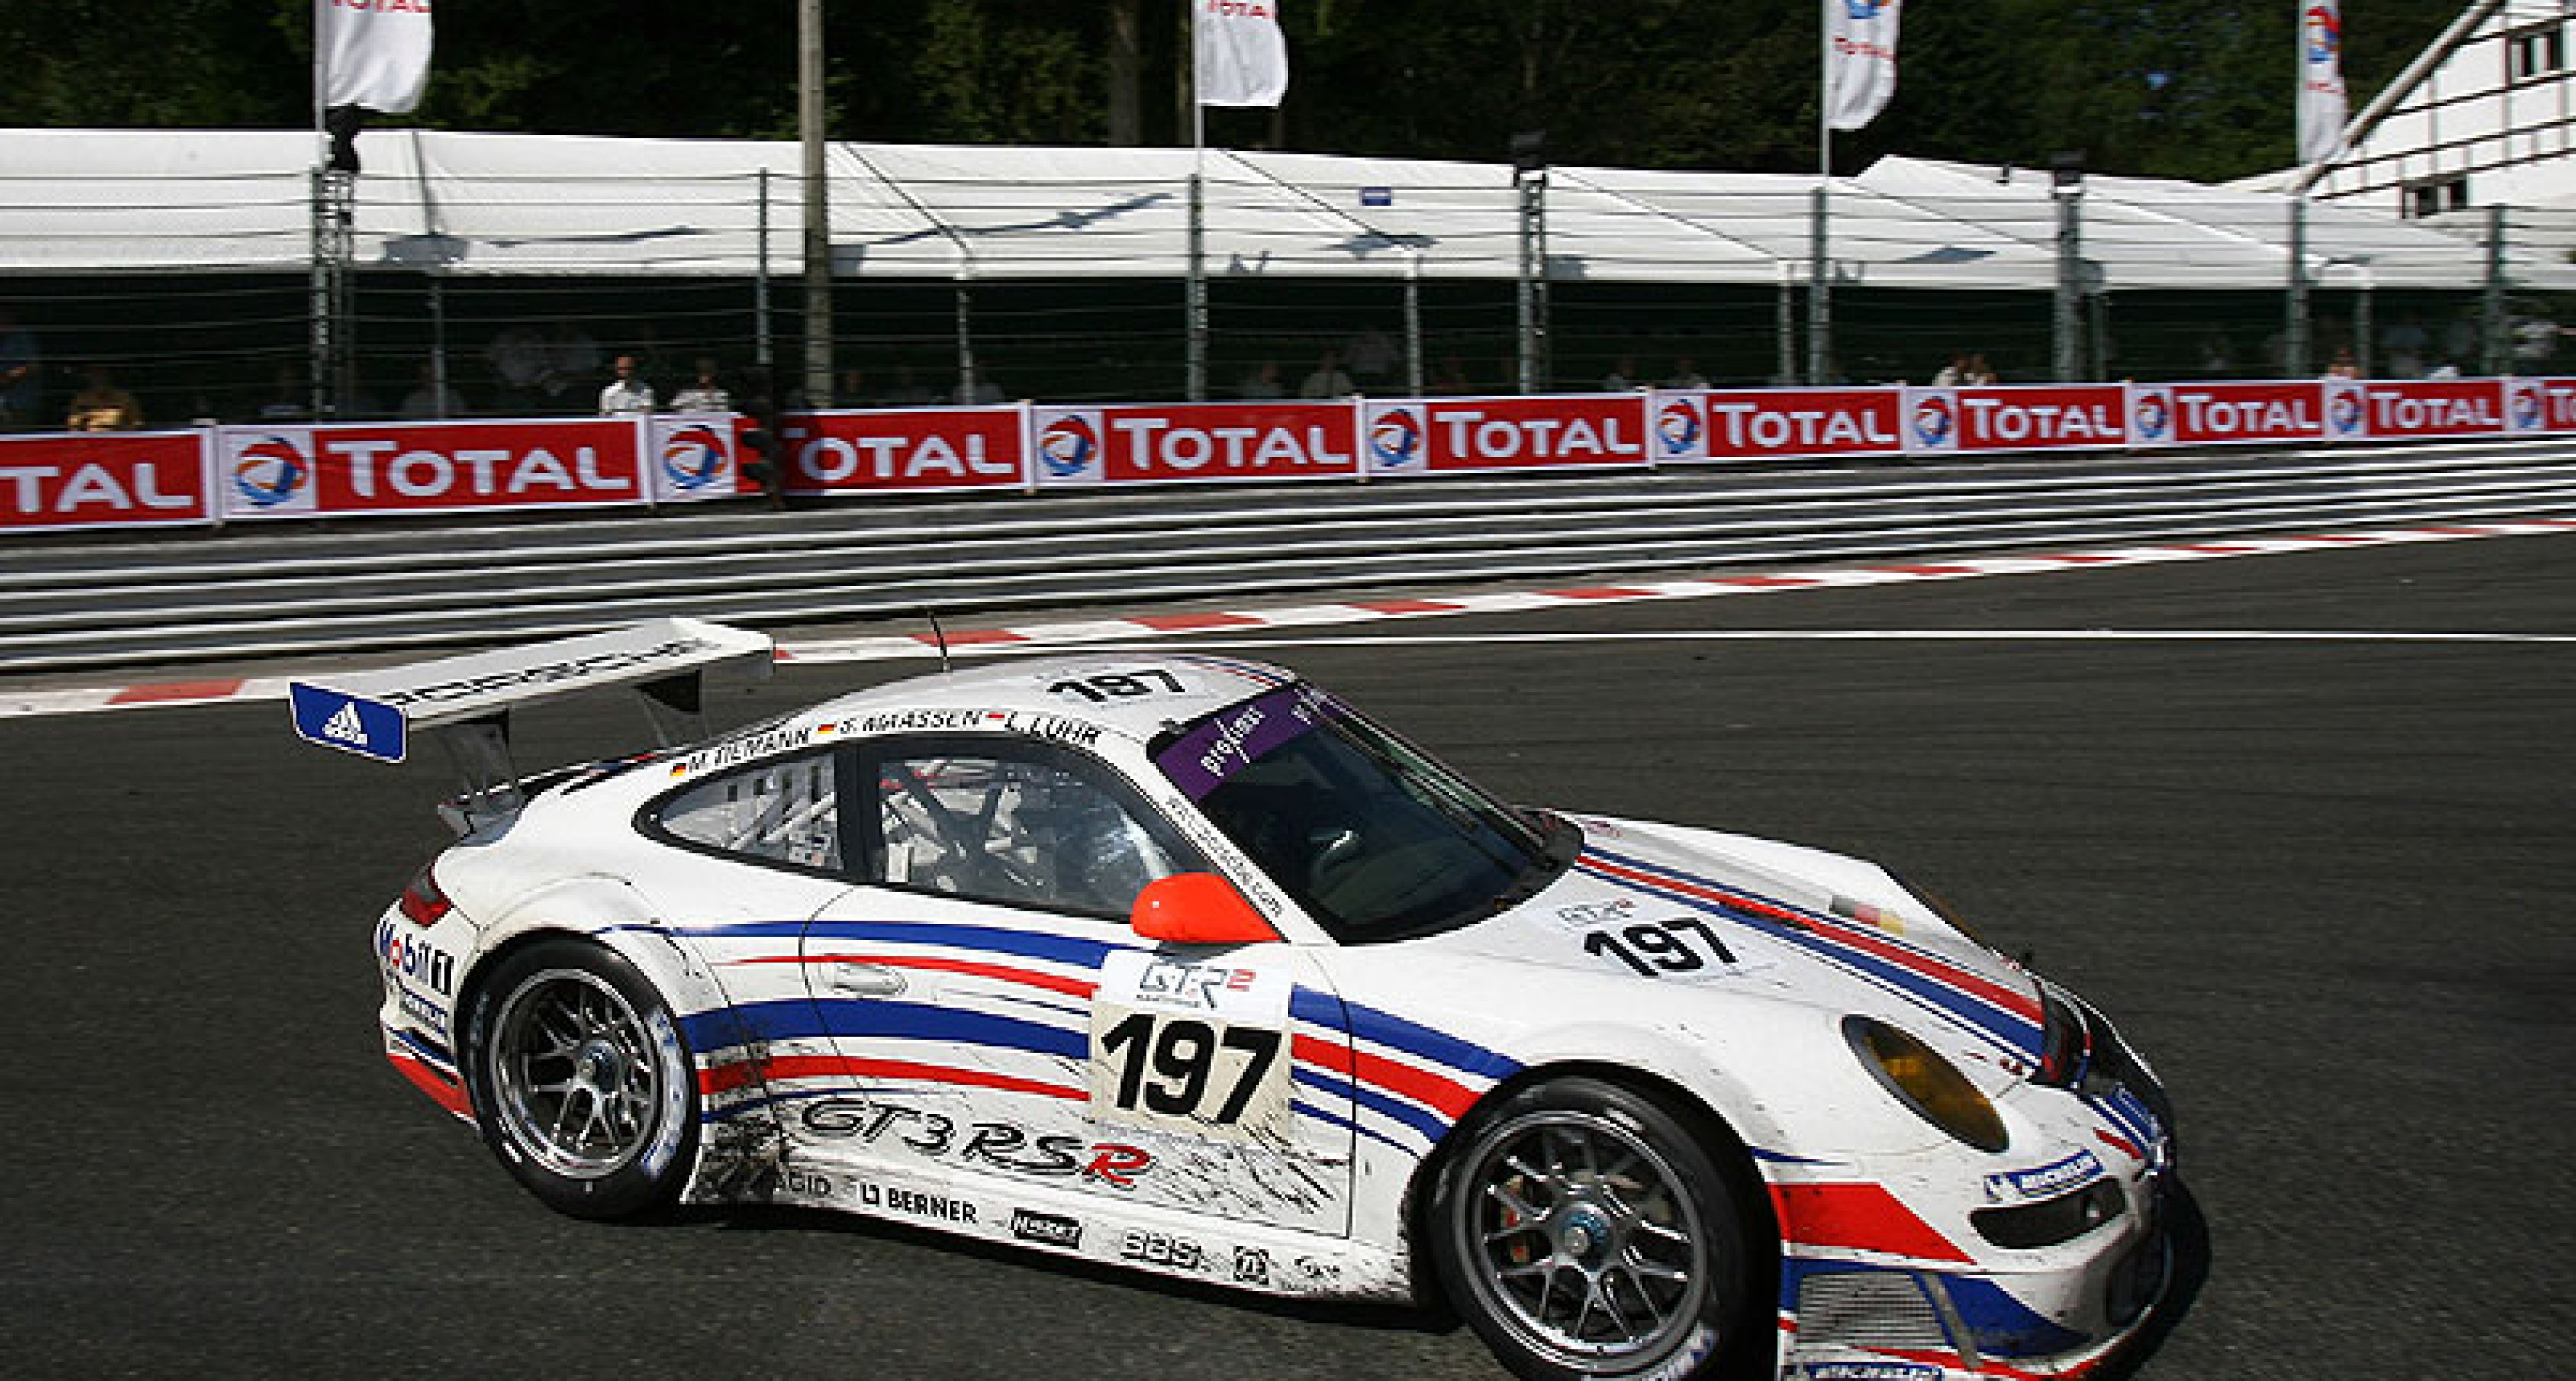 Spa 24 Hours 2006